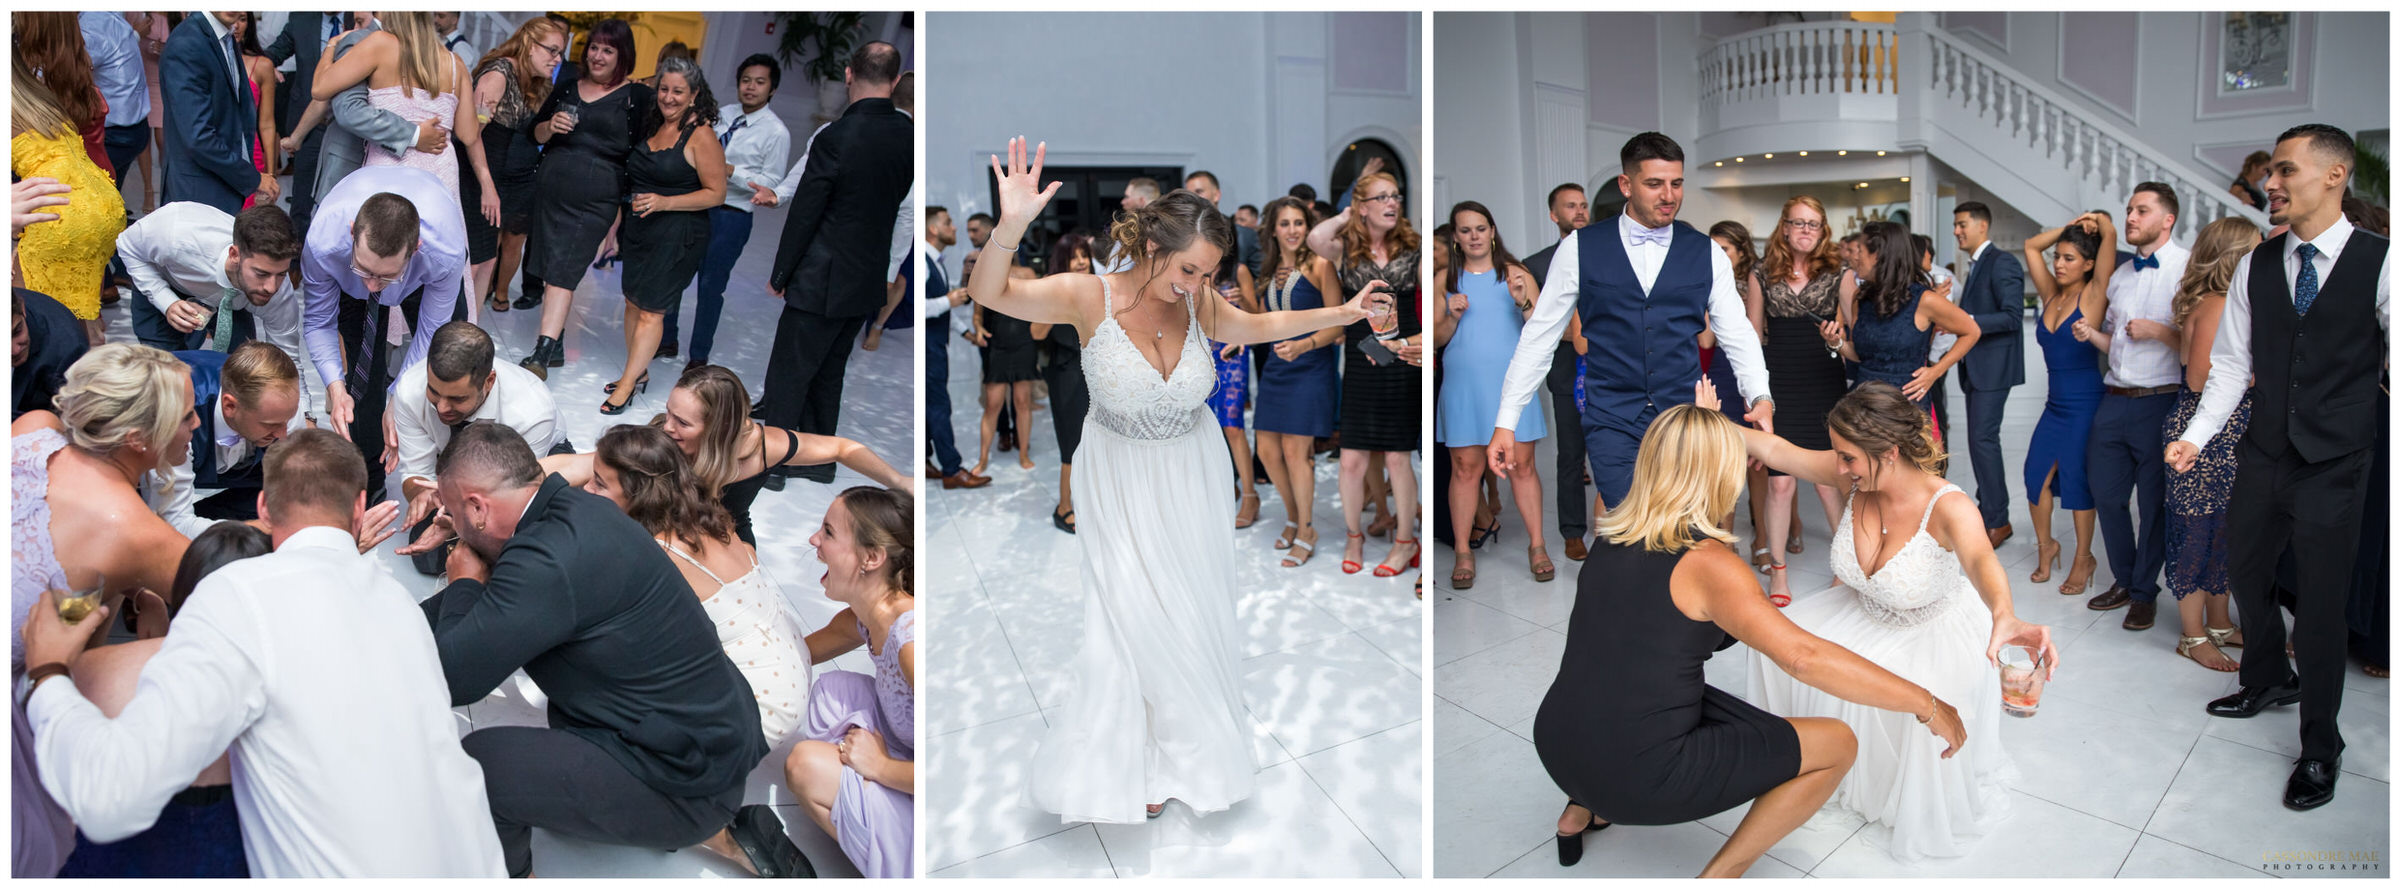 Cassondre Mae Photography Villa Venezia Wedding Photographer 44.jpg